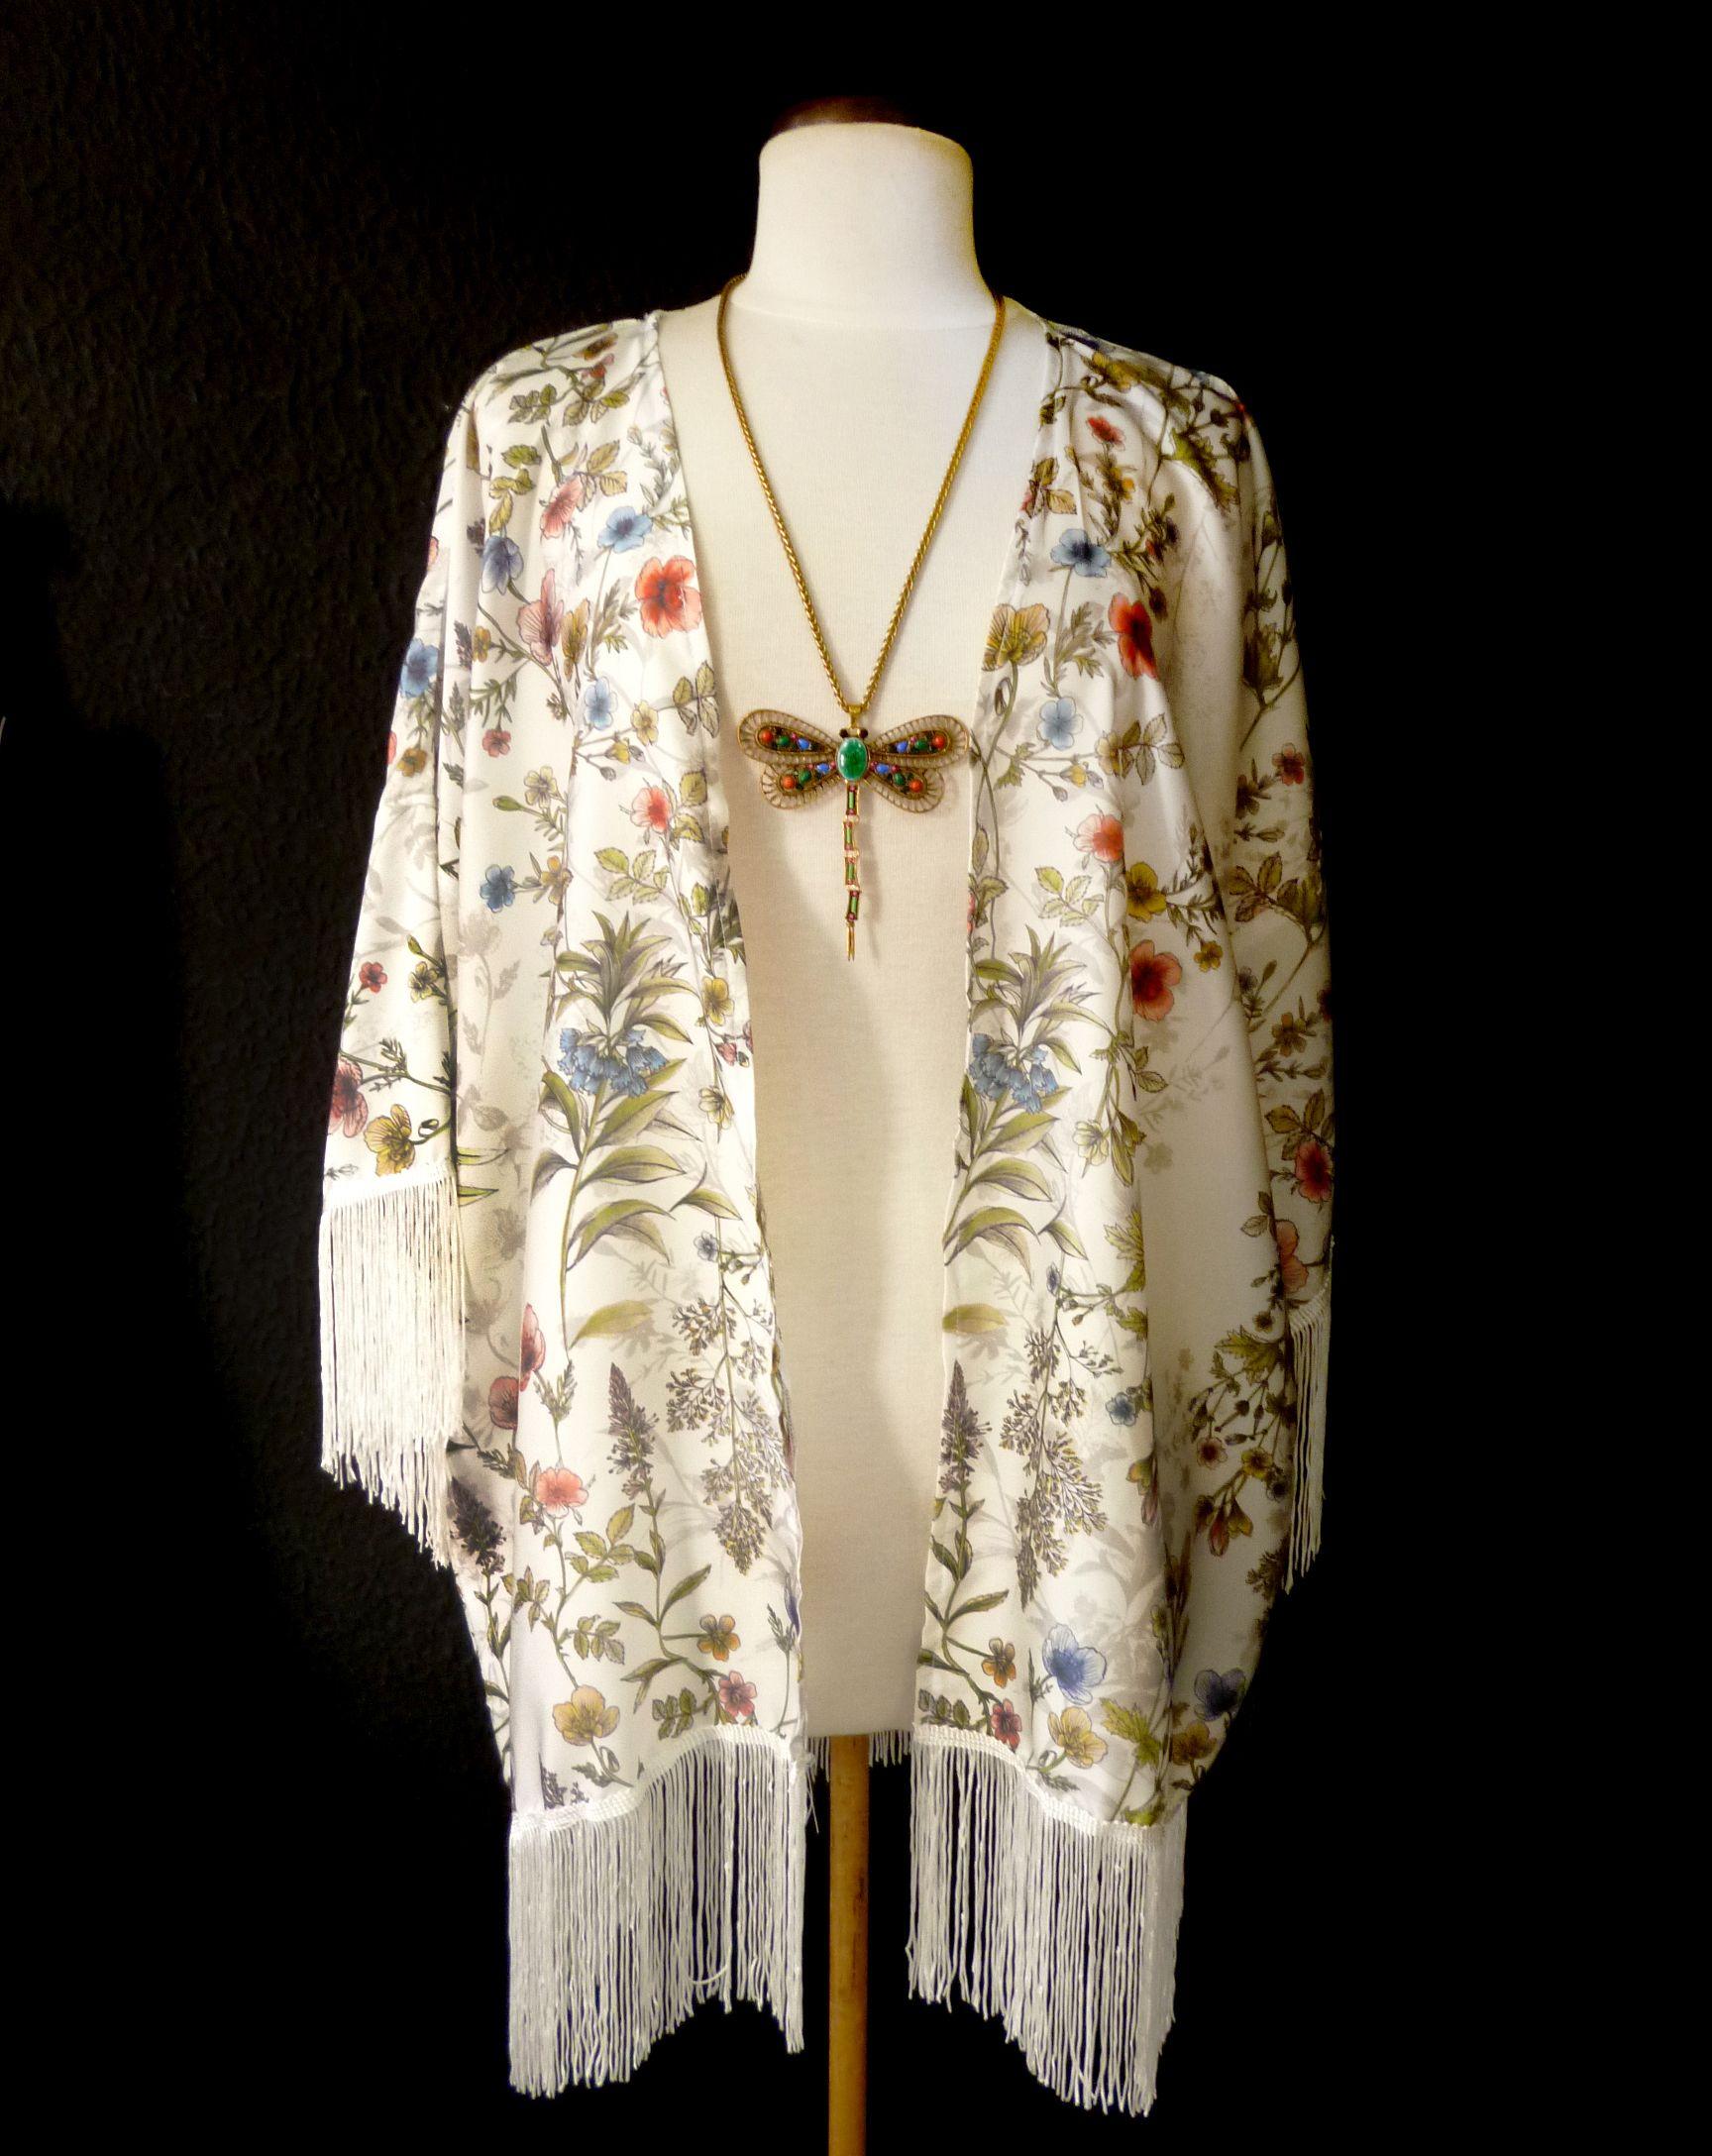 054e011da42b Quimono   Molde + Passo-a-passo em PDF #kimono #fashion #sewing  #sewingpattern #costura #moldes